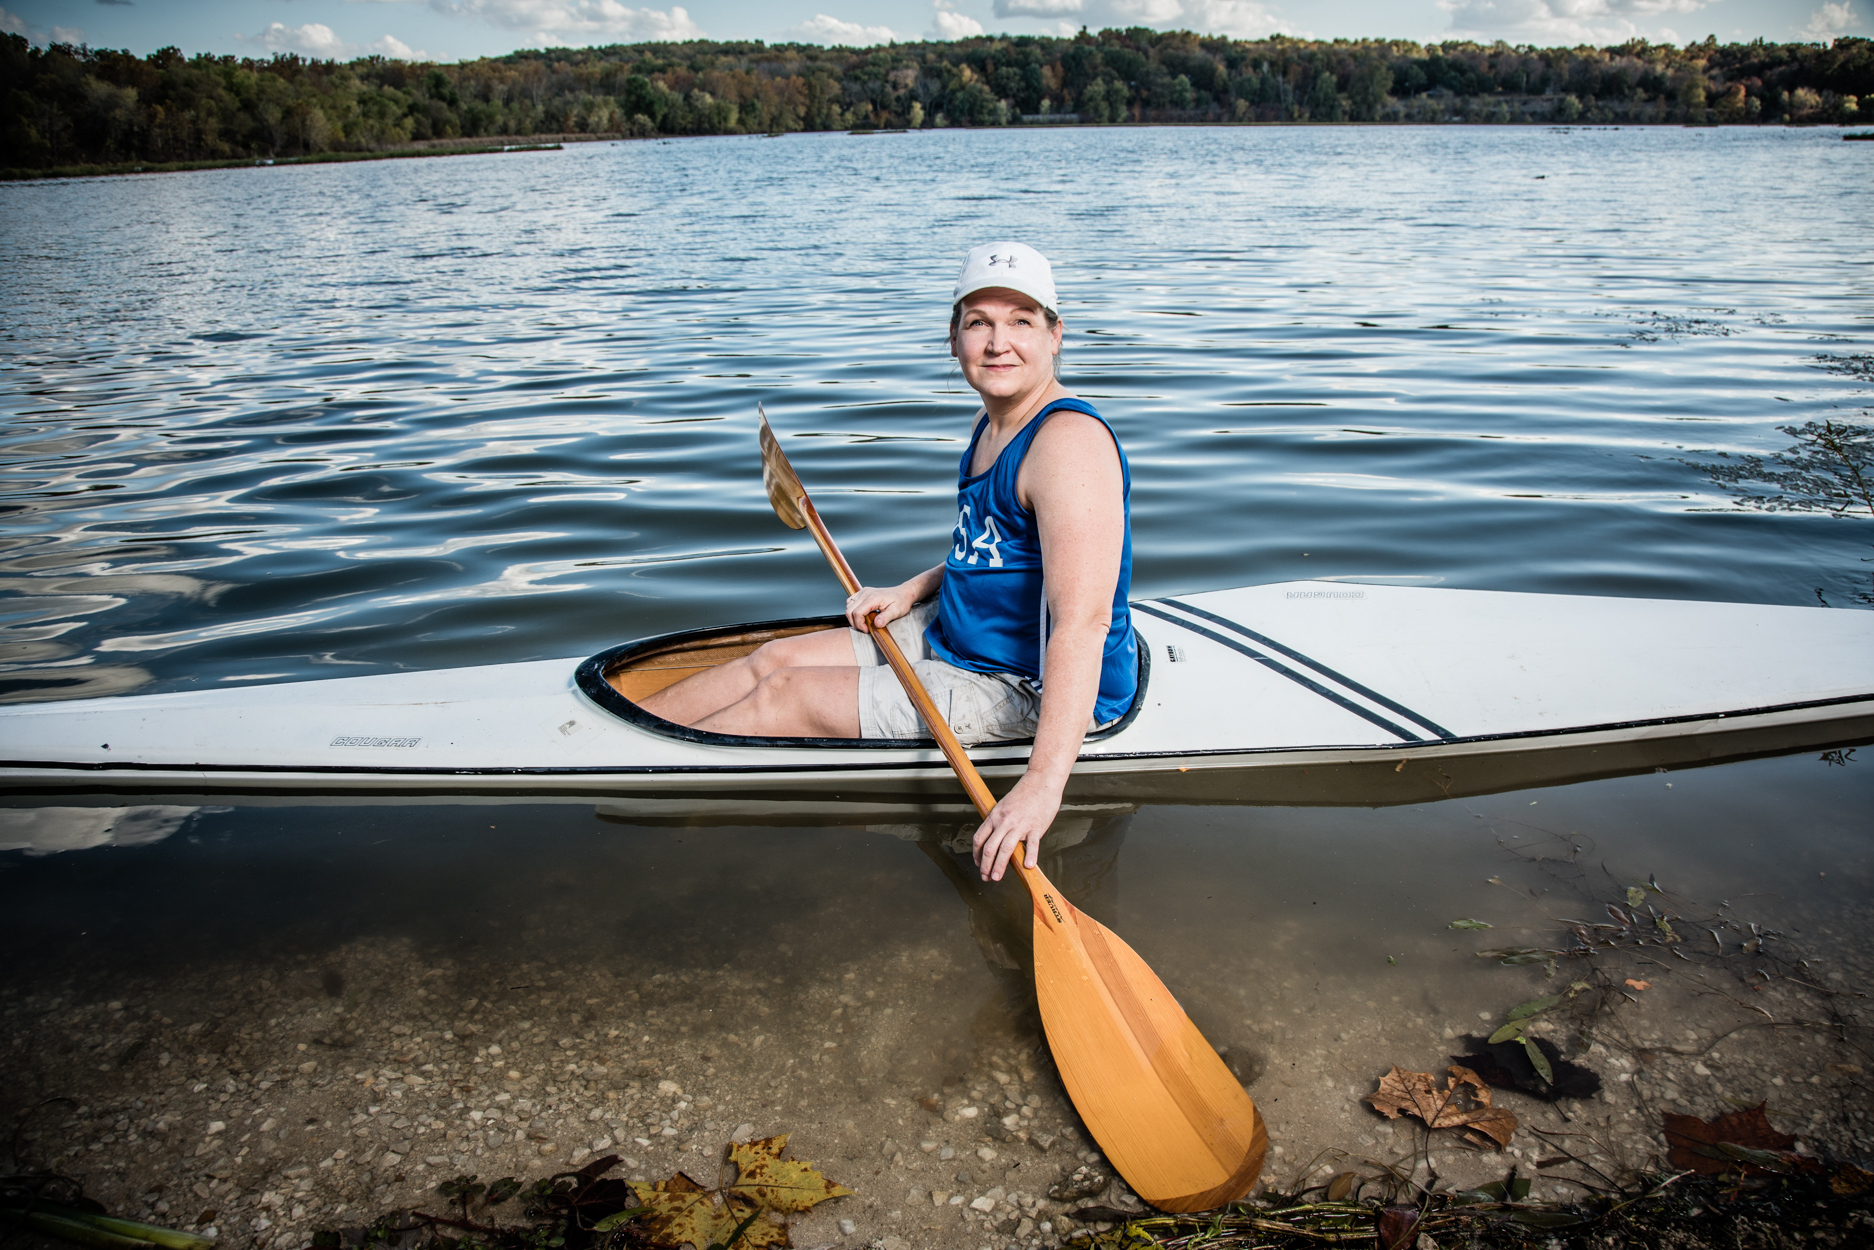 cancer survivor olympic kayak